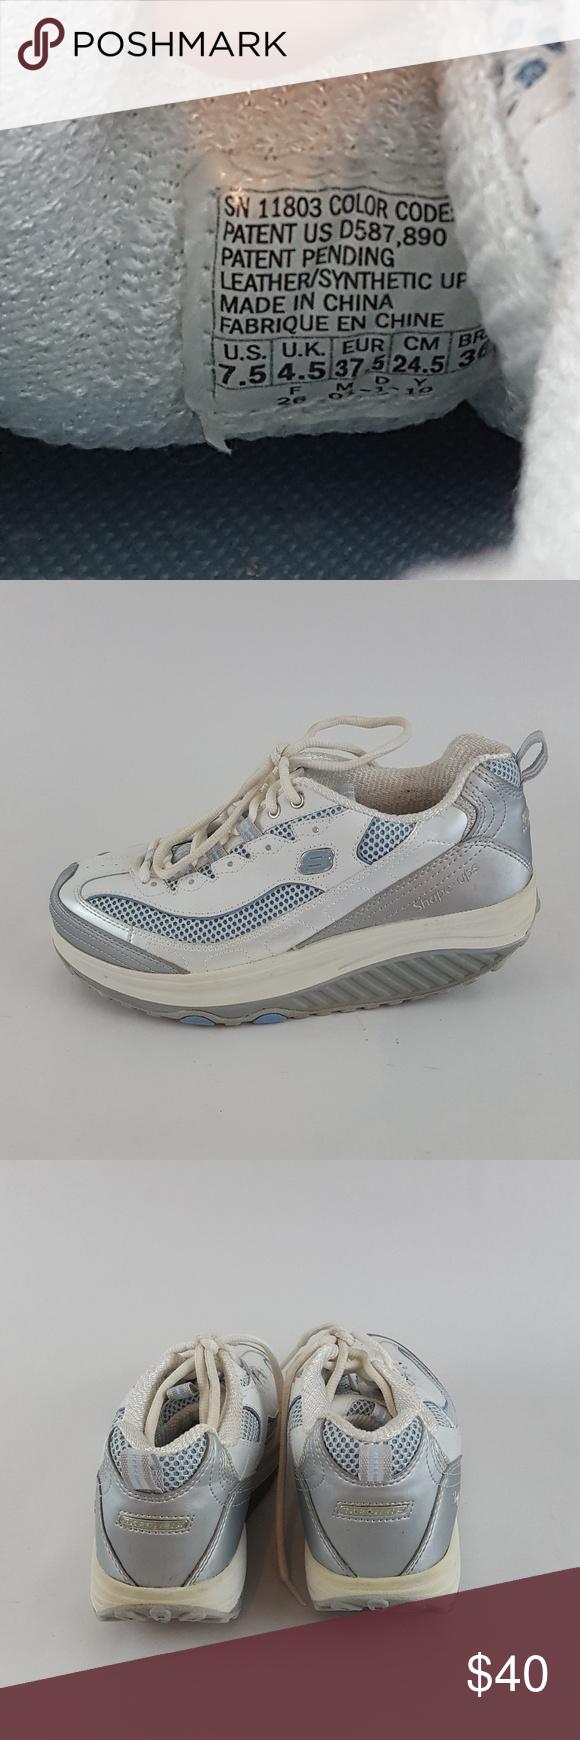 364e24315e8 Skechers Shape Ups Jump Start Toning Walking White Good Skechers Shoes